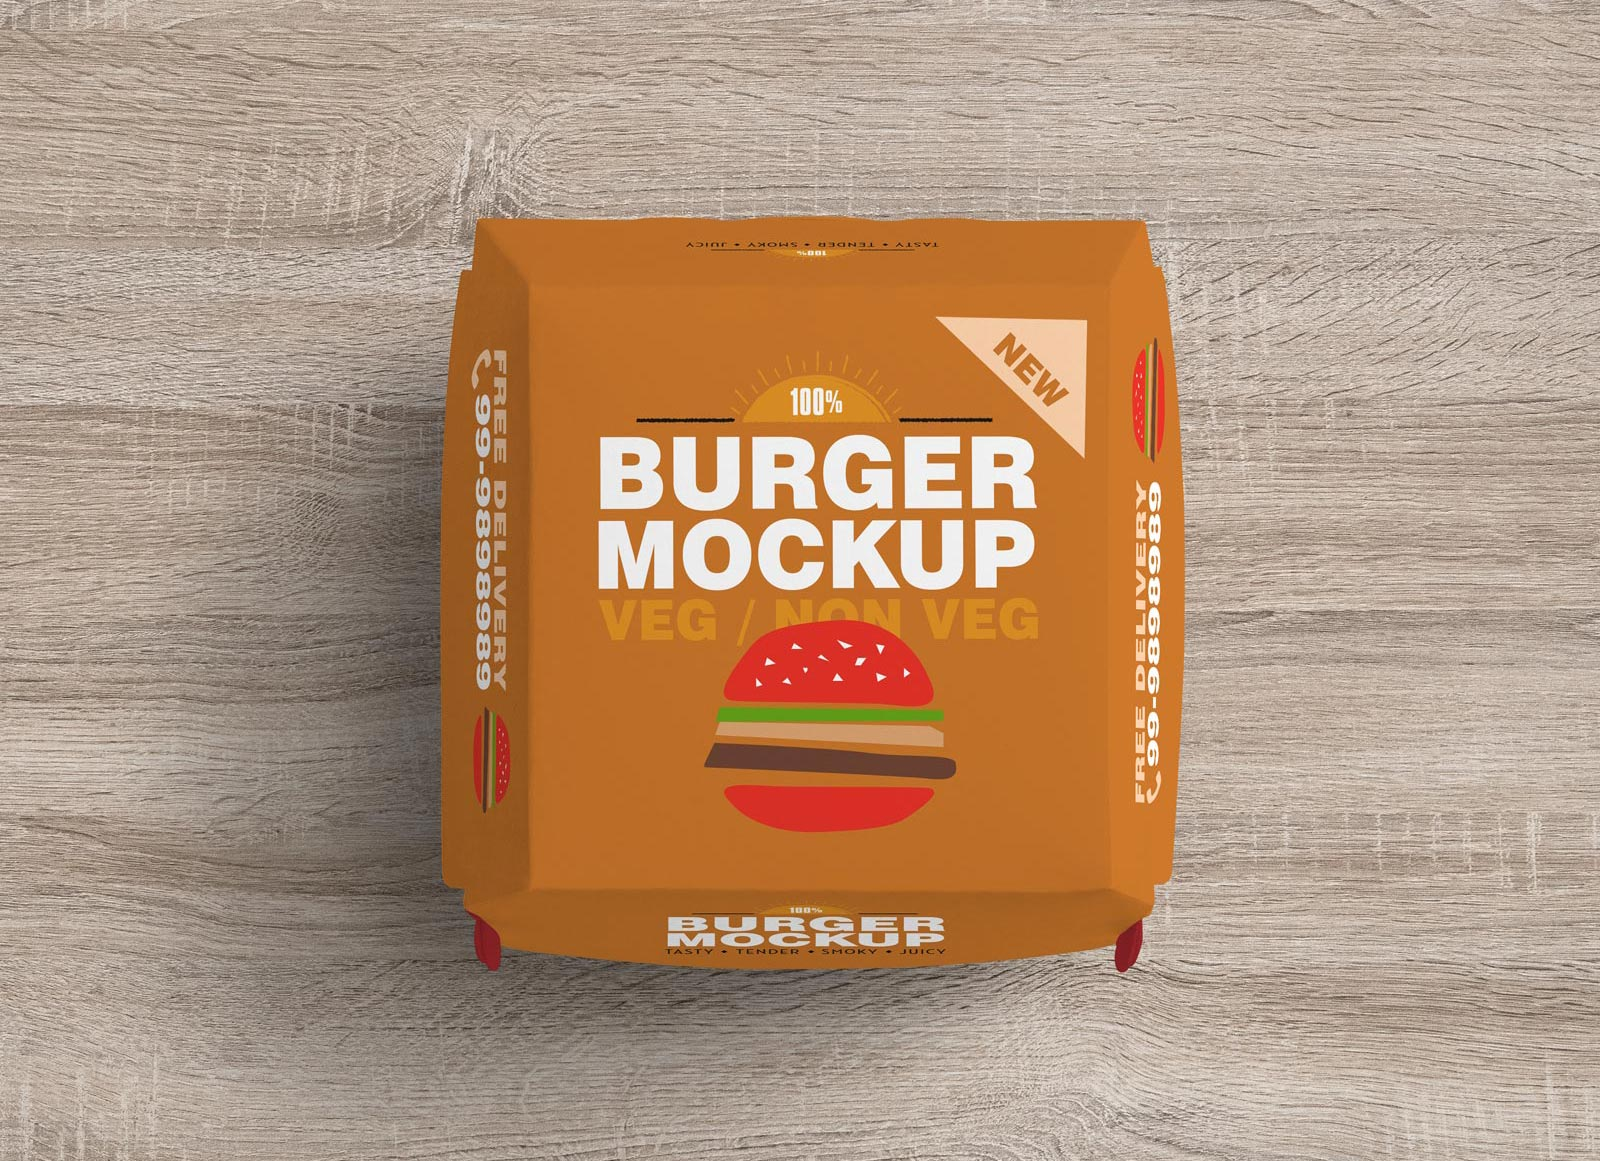 Free-Top-View-Burger-Packaging-Mockup-PSD